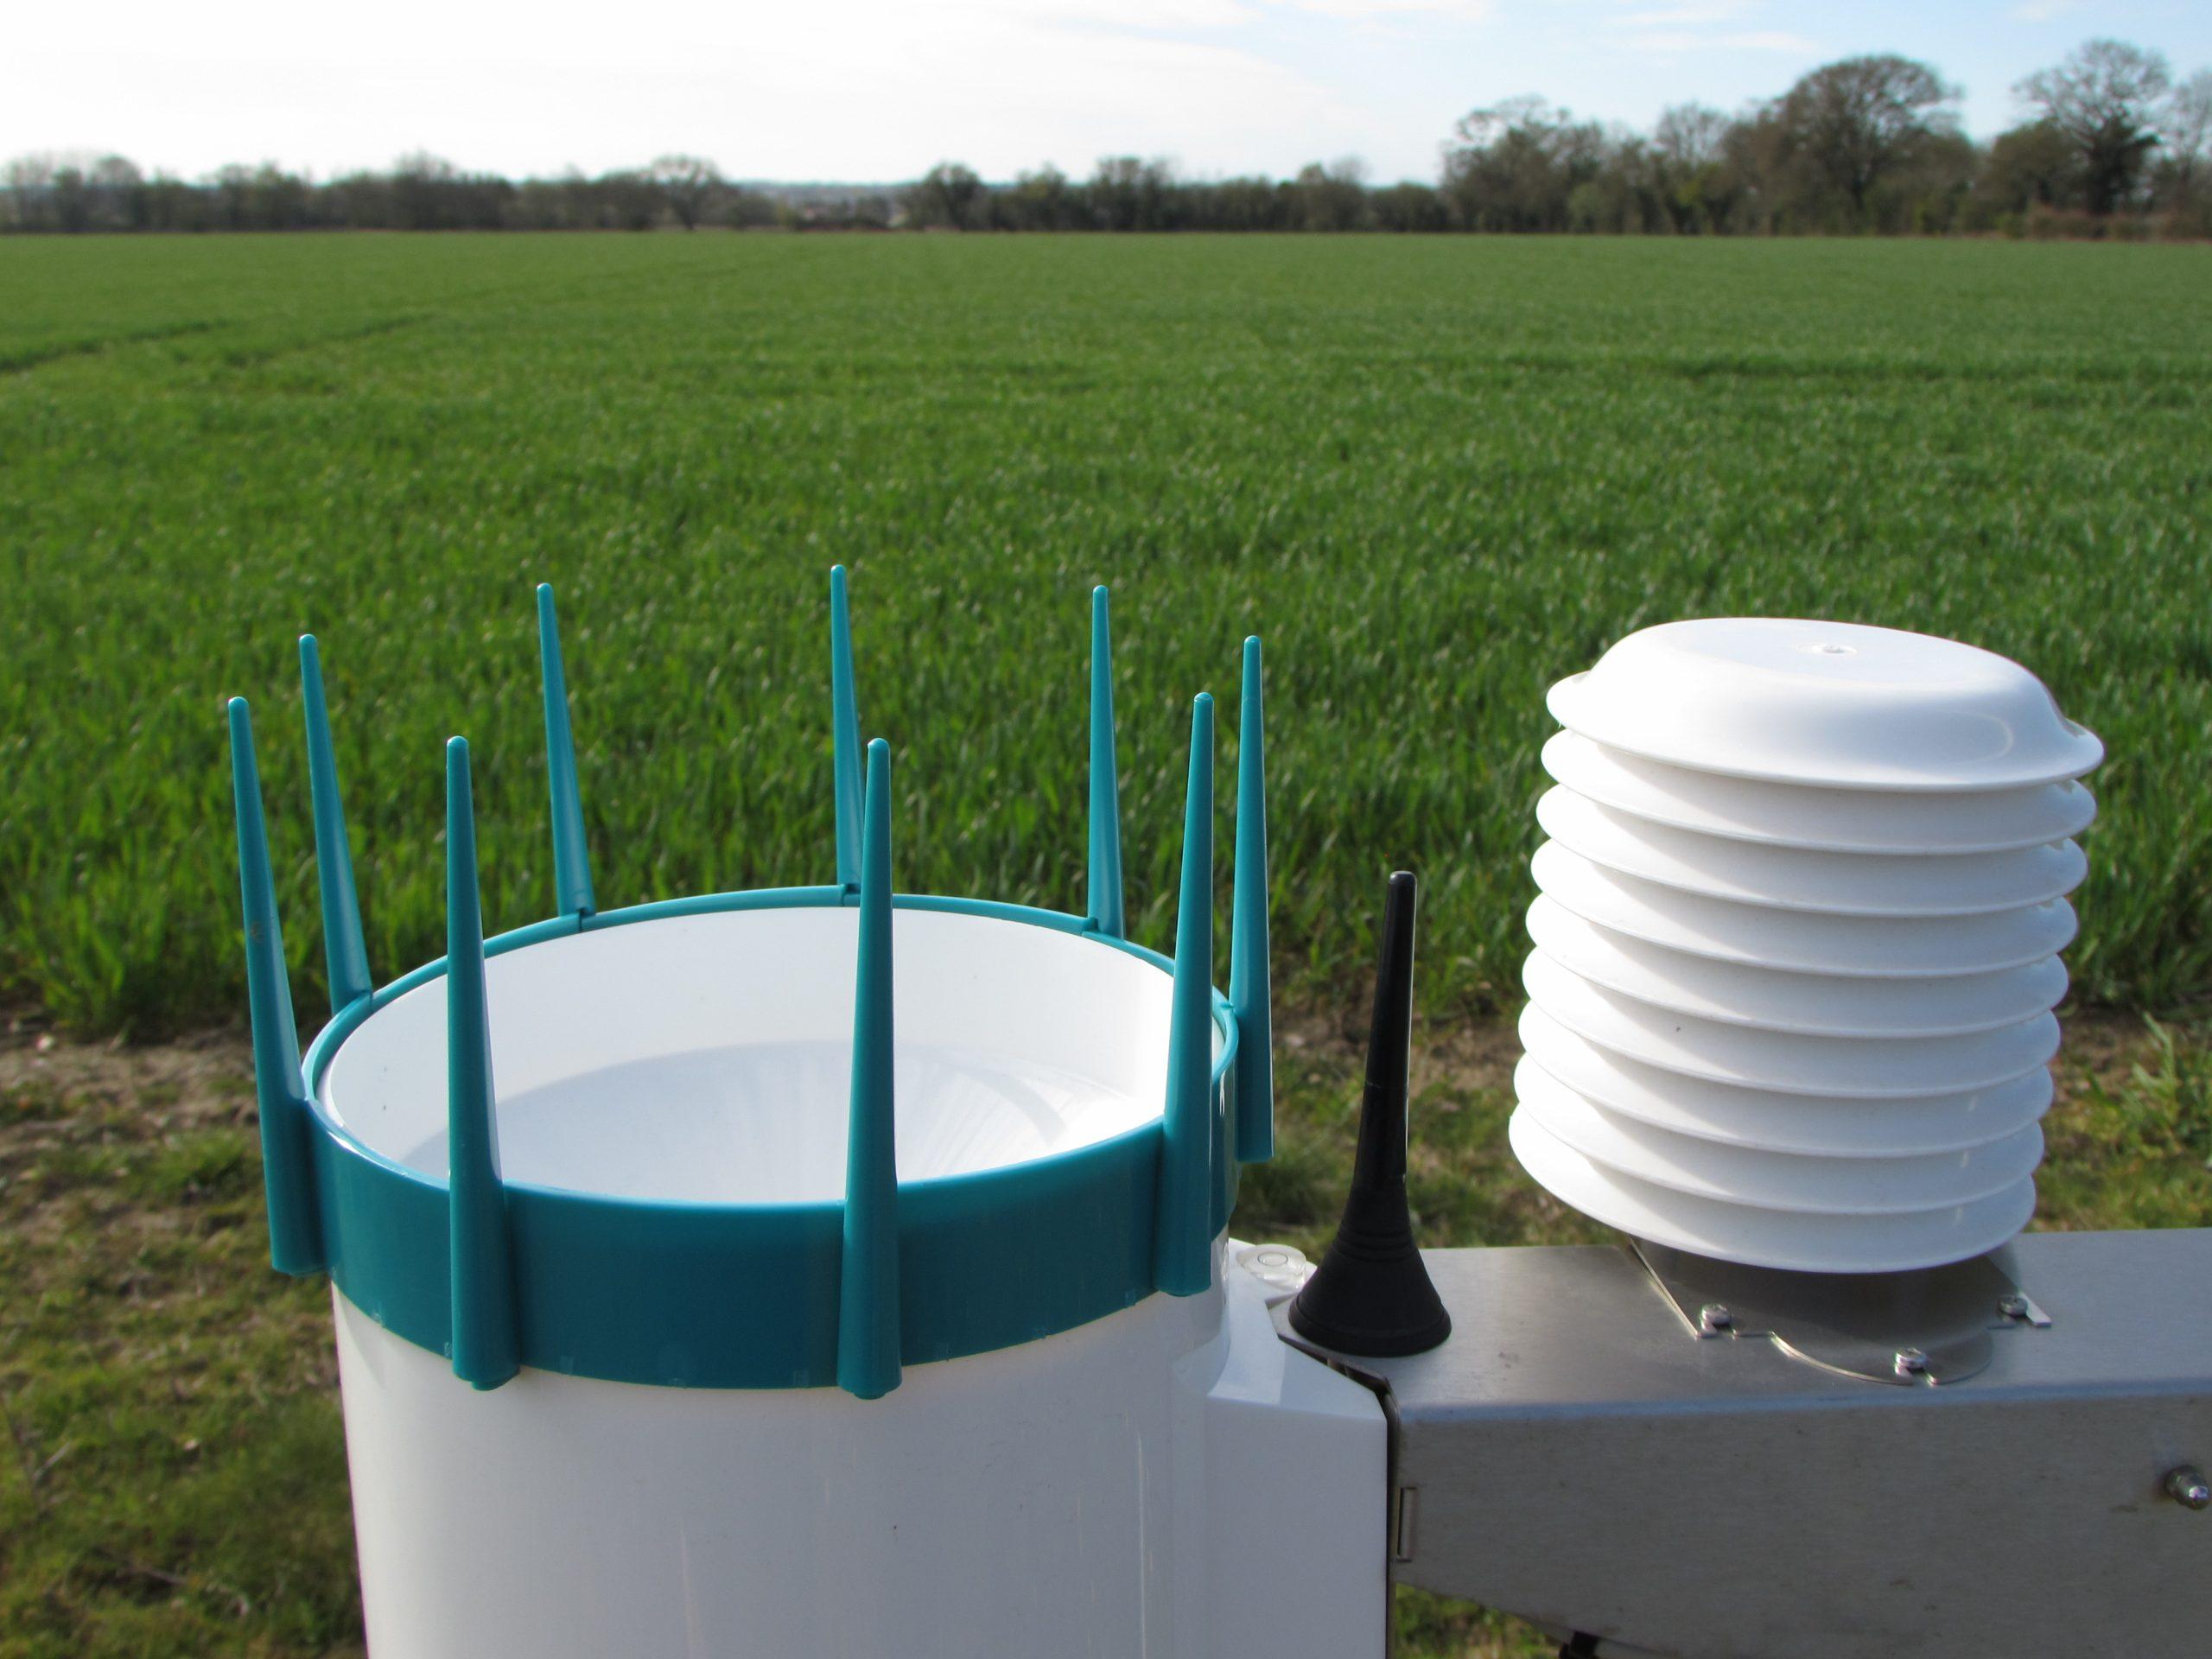 TMAF new weather station at Morley Farm